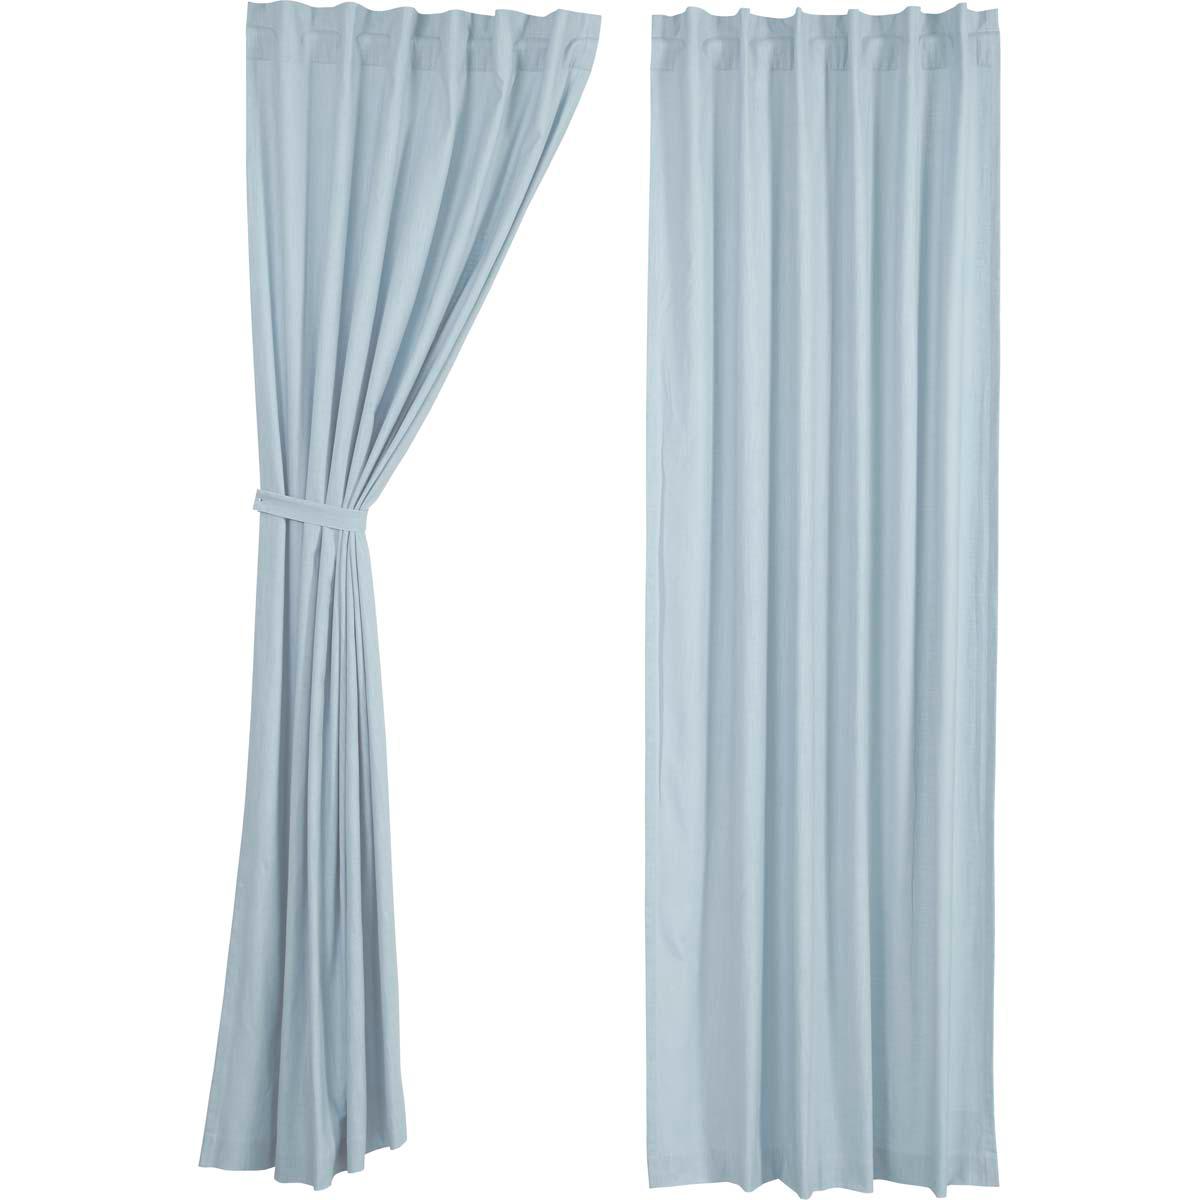 Regina Light Blue Panel Curtains 108x55 Romanblindsandcurtains